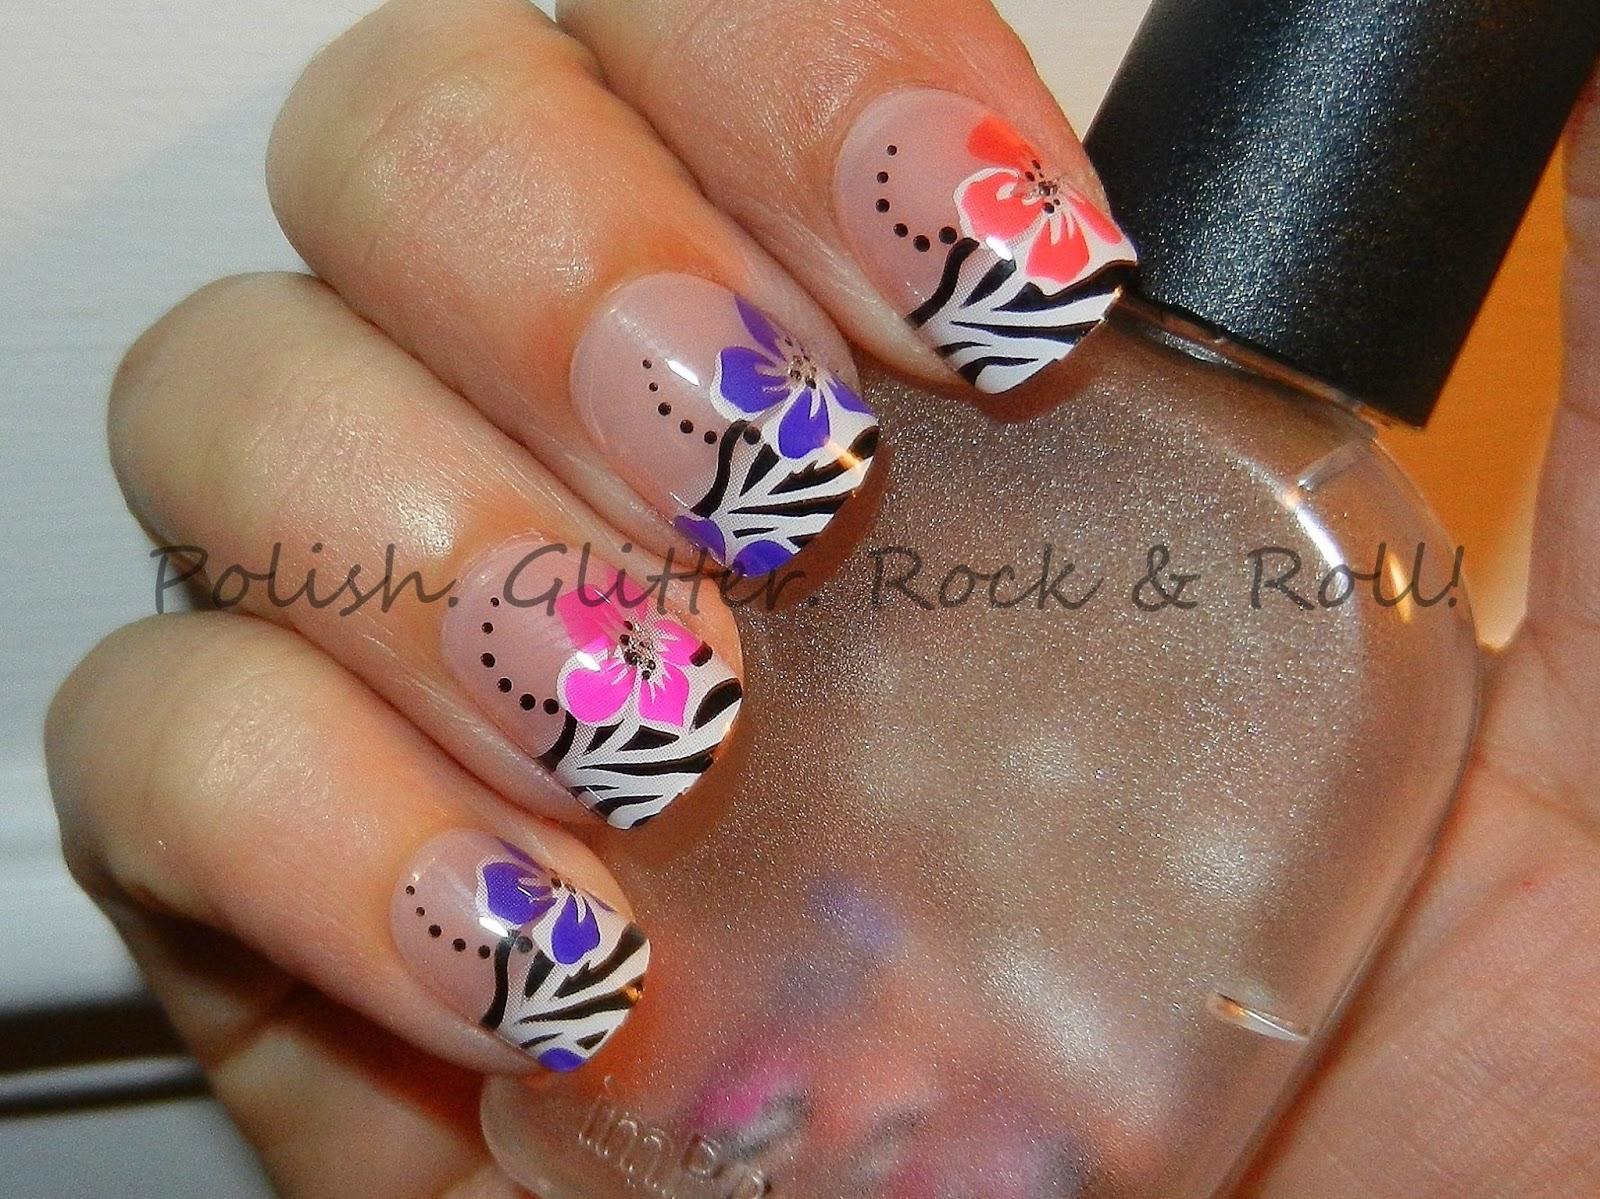 Polish. Glitter. Rock & Roll!: imPRESS Press-On Nails Review - Final ...